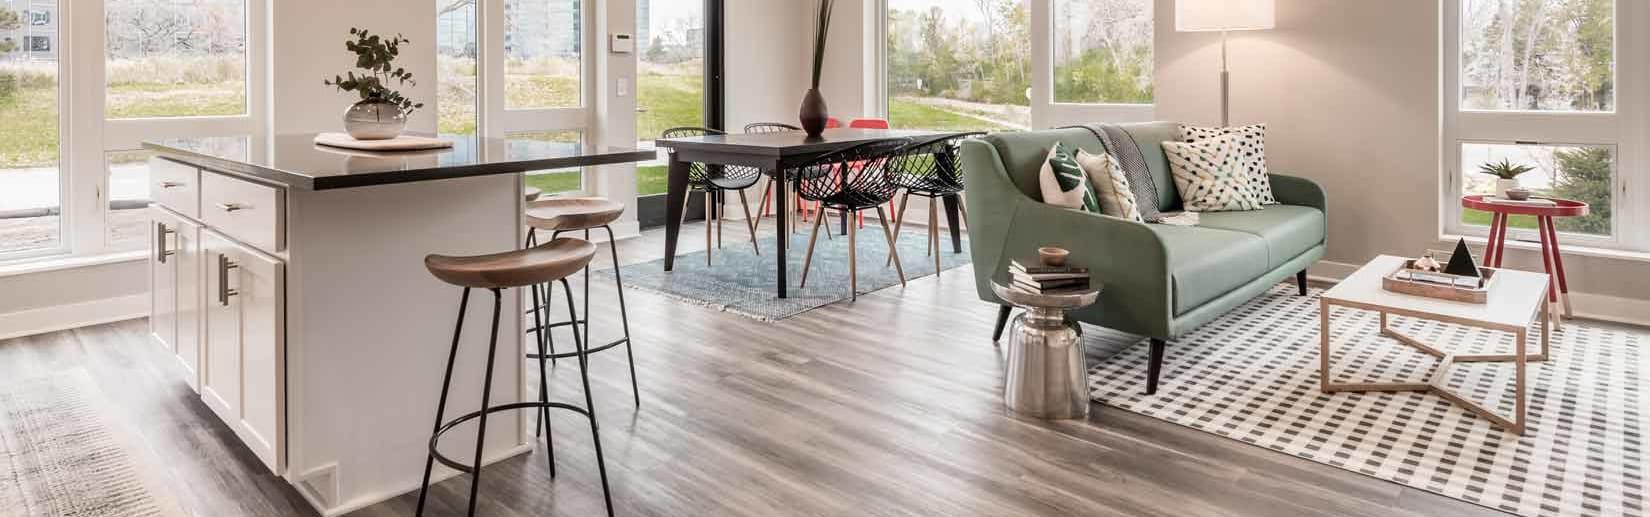 Interior photo of apartment with hardwood floors and quartz countertops